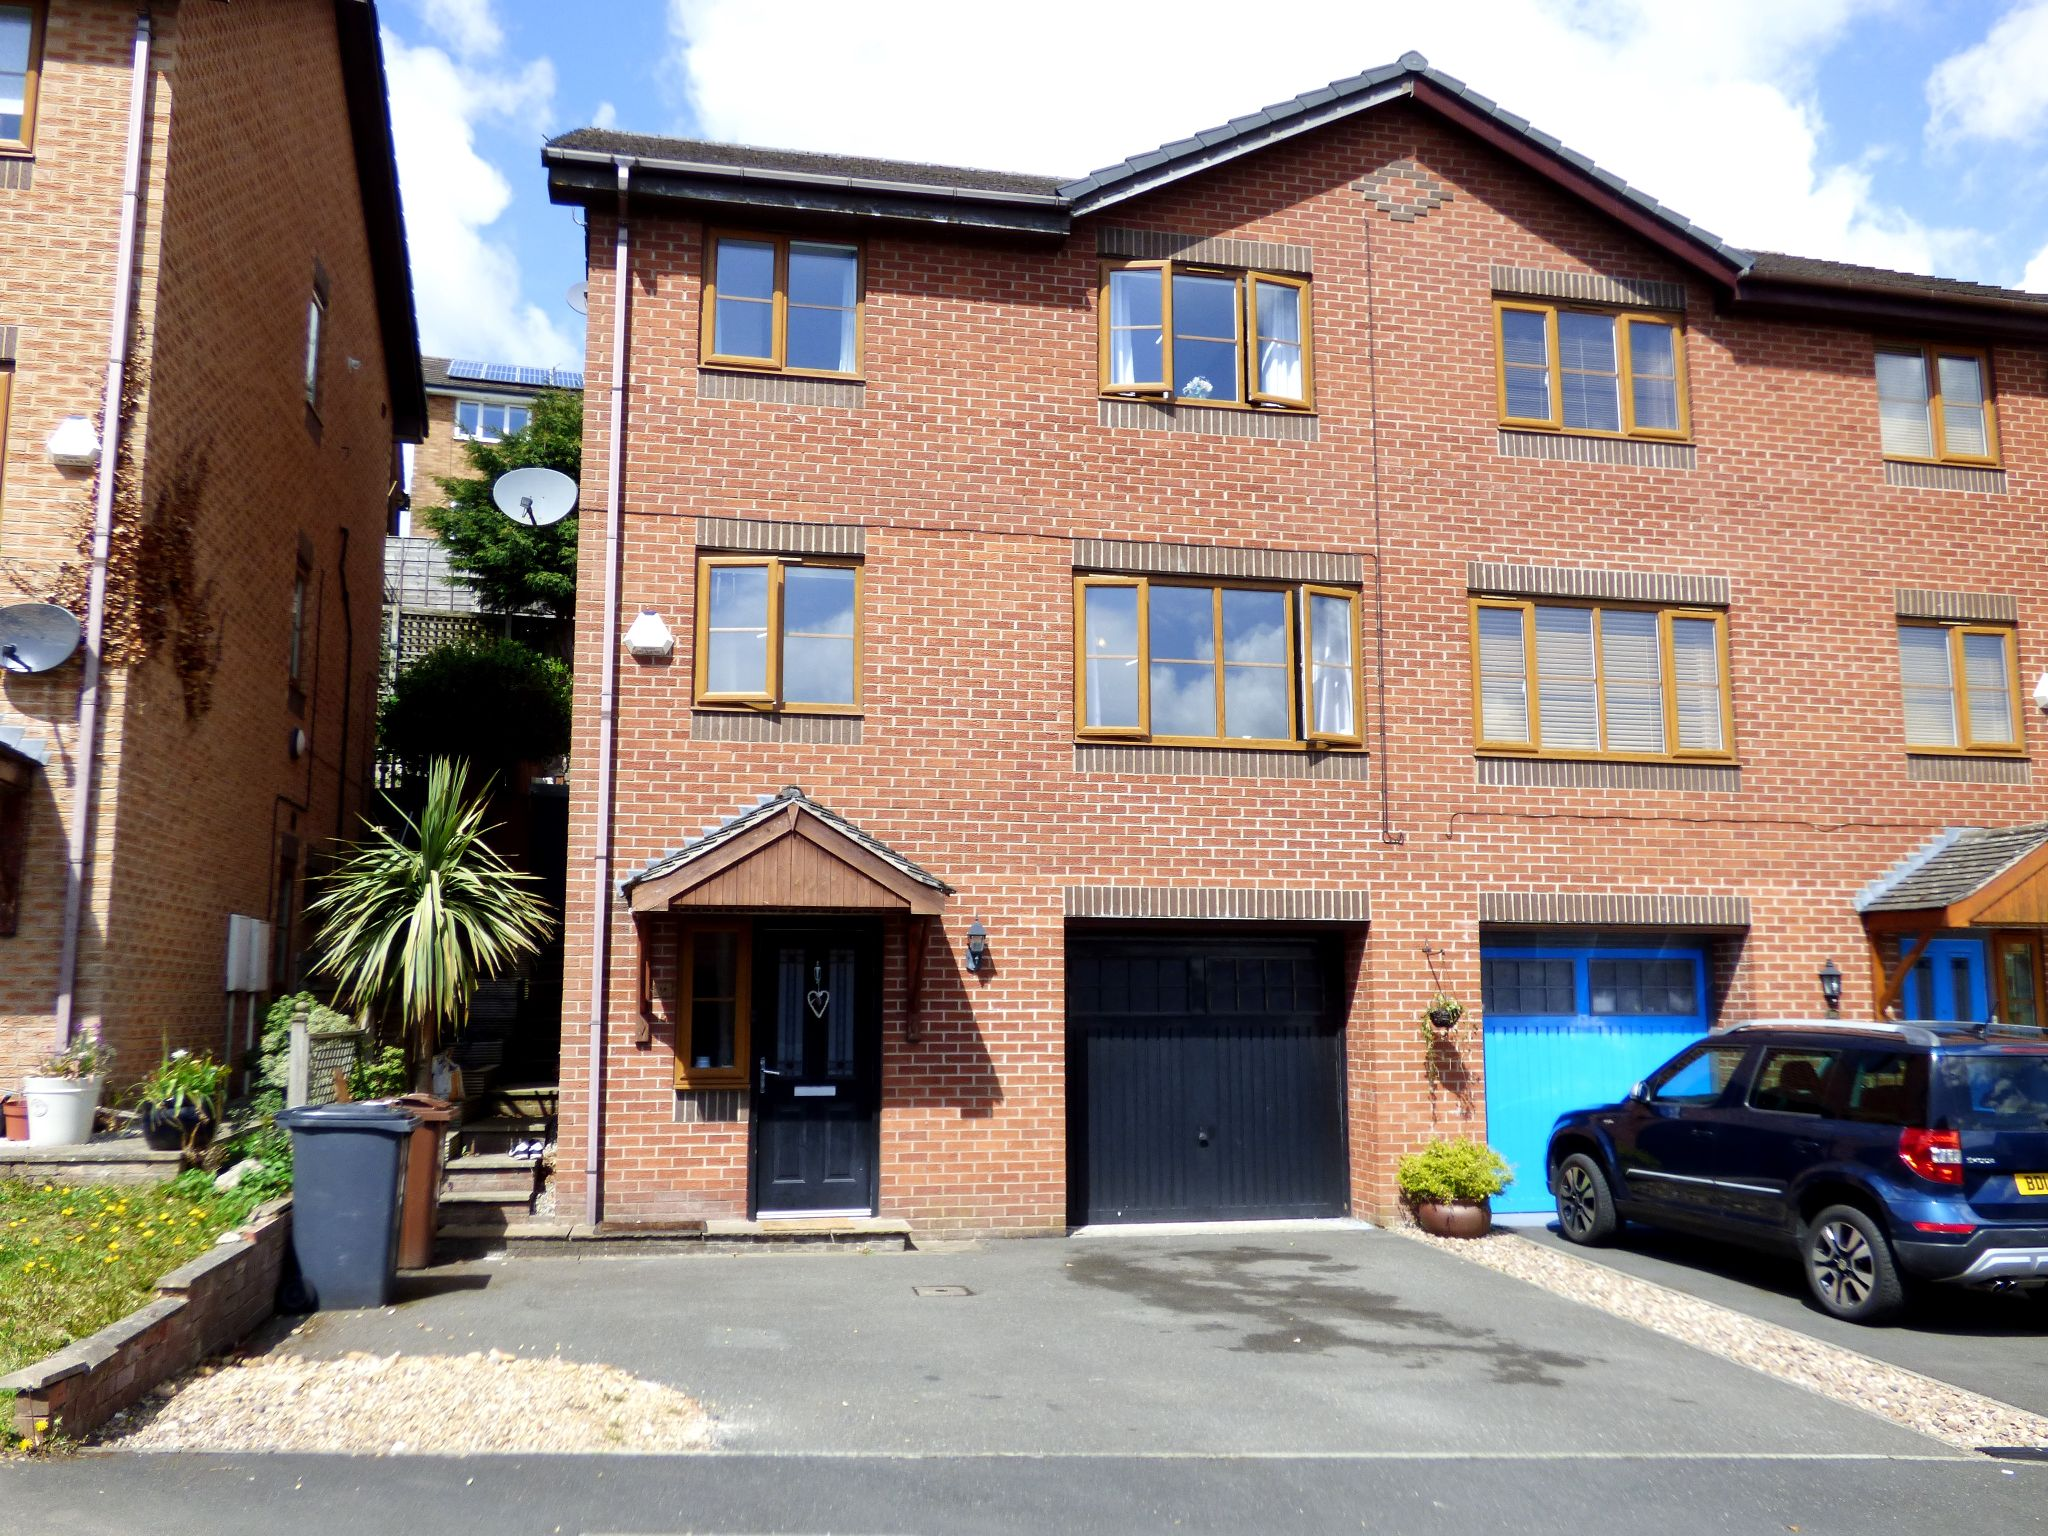 4 Bedroom Semi-detached House For Sale - Front External